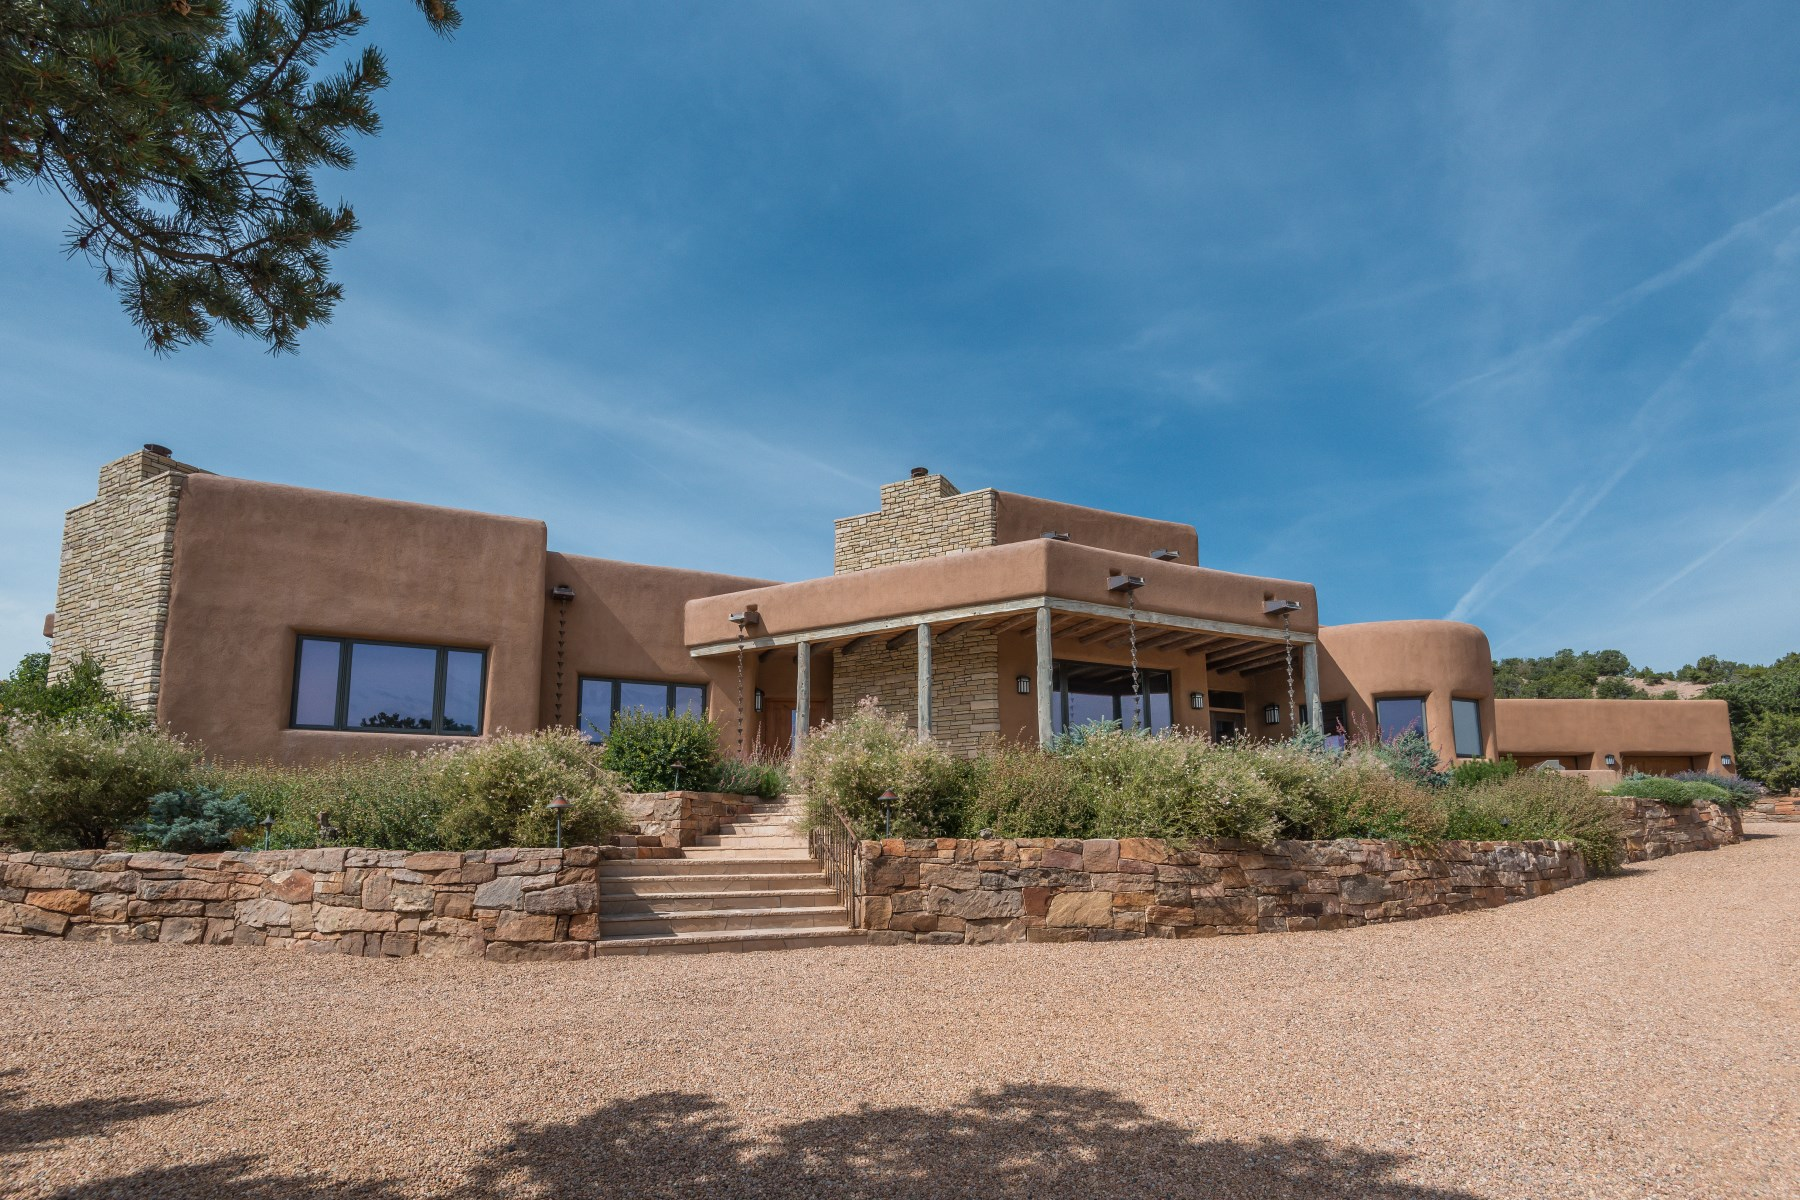 Single Family Home for Sale at 2962 Broken Sherd Trail Santa Fe City Northwest, Santa Fe, New Mexico 87506 United States